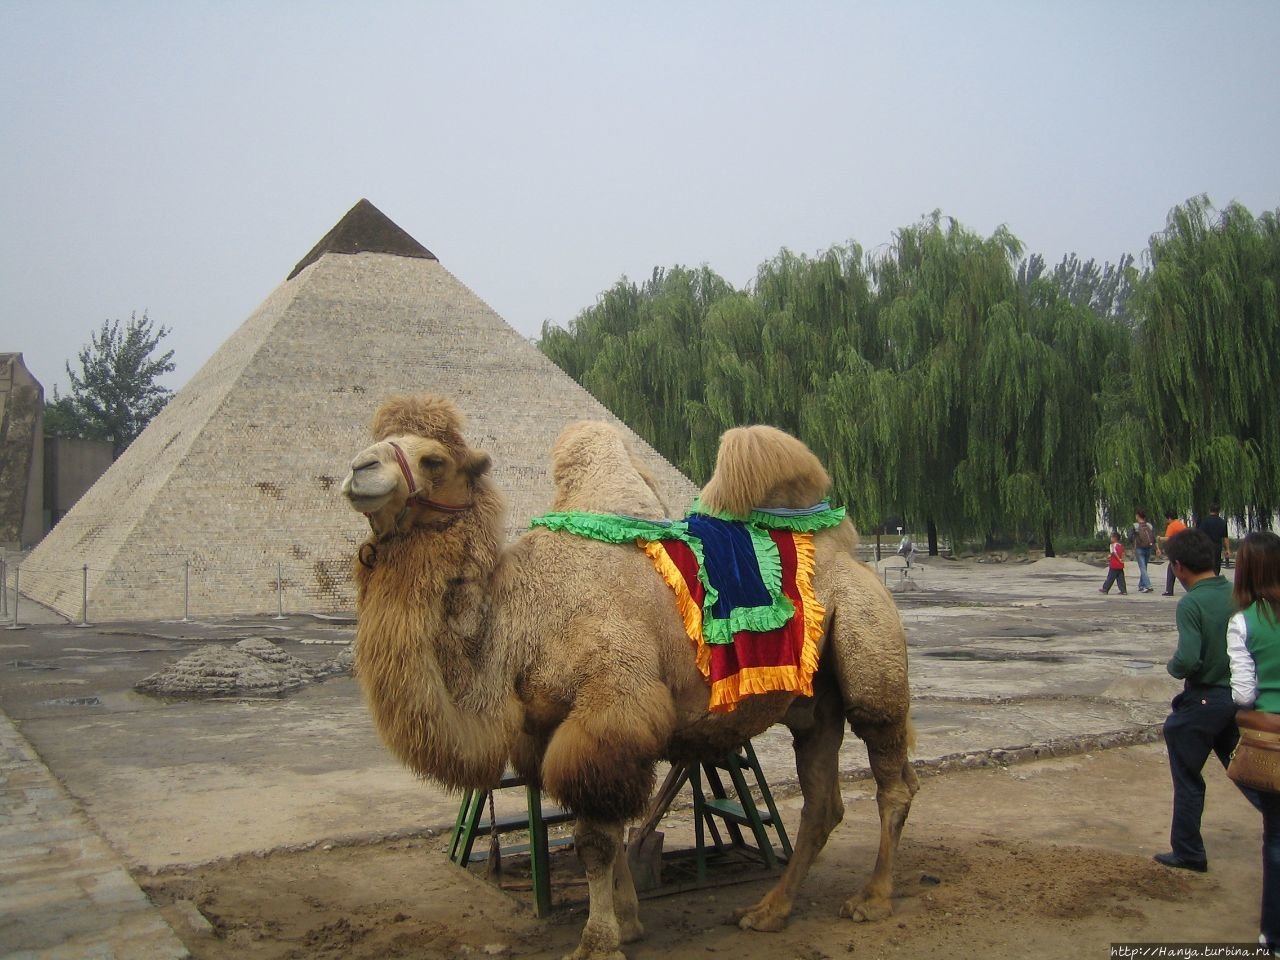 Пекин. Парк Миниатюр.Егип